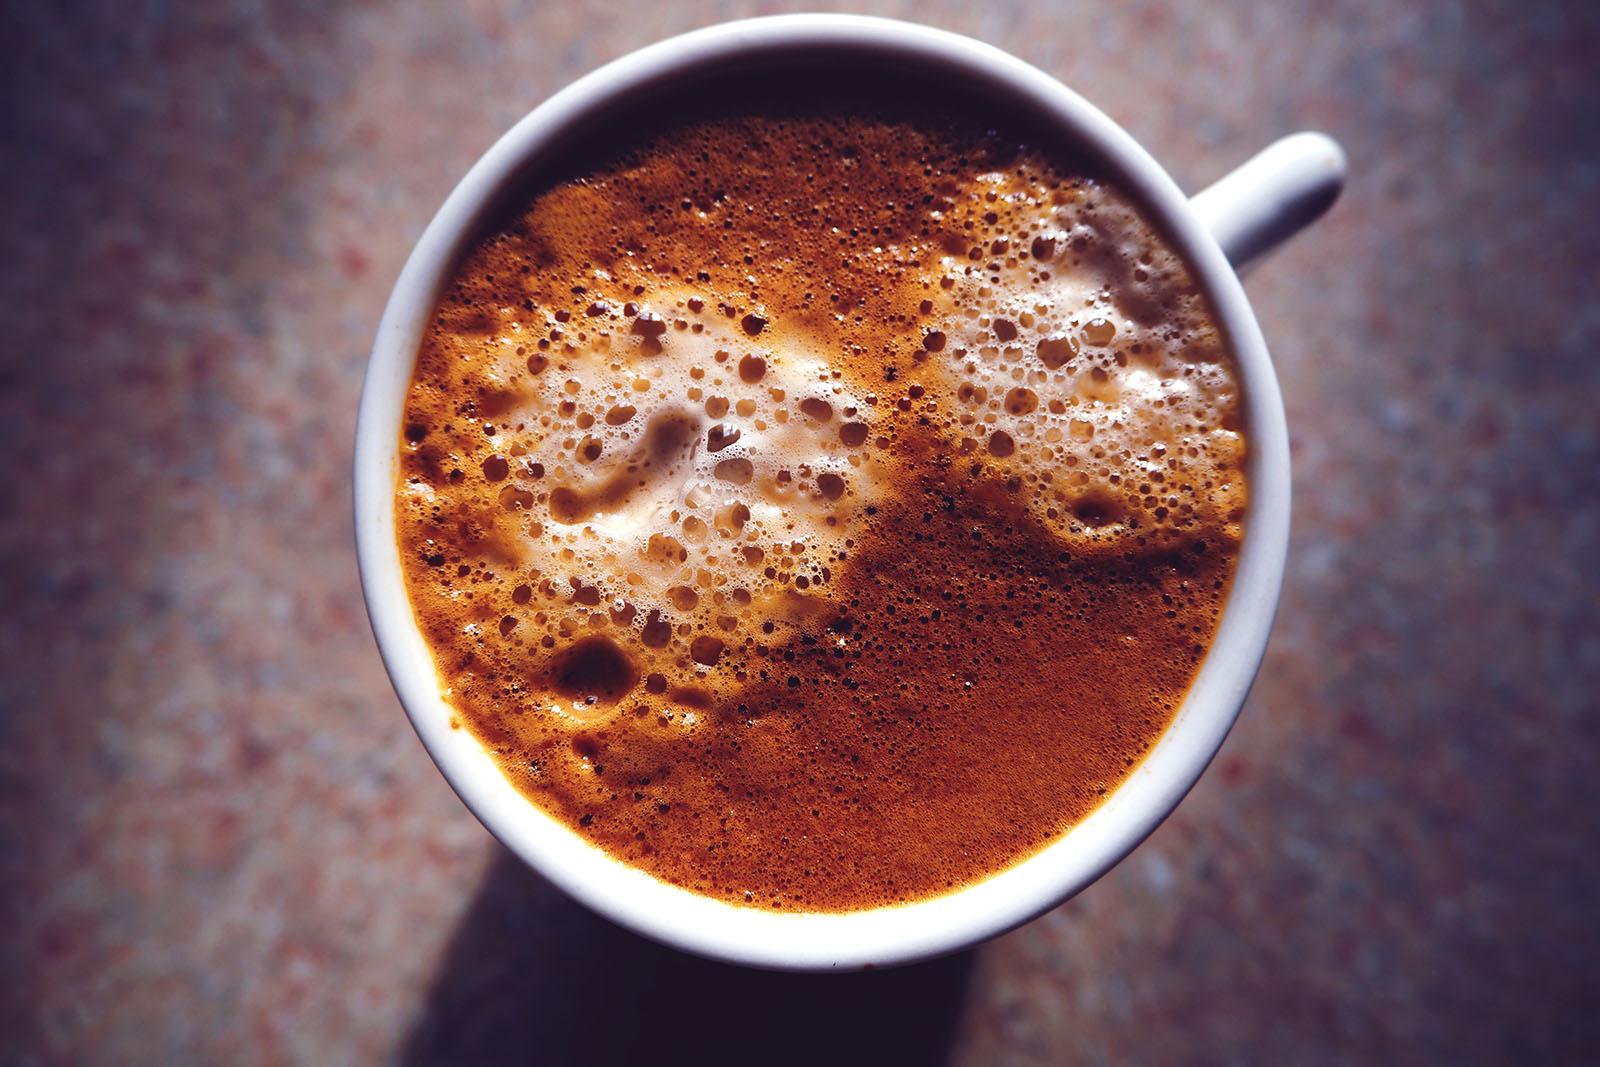 beverage-breakfast-cafe-362137